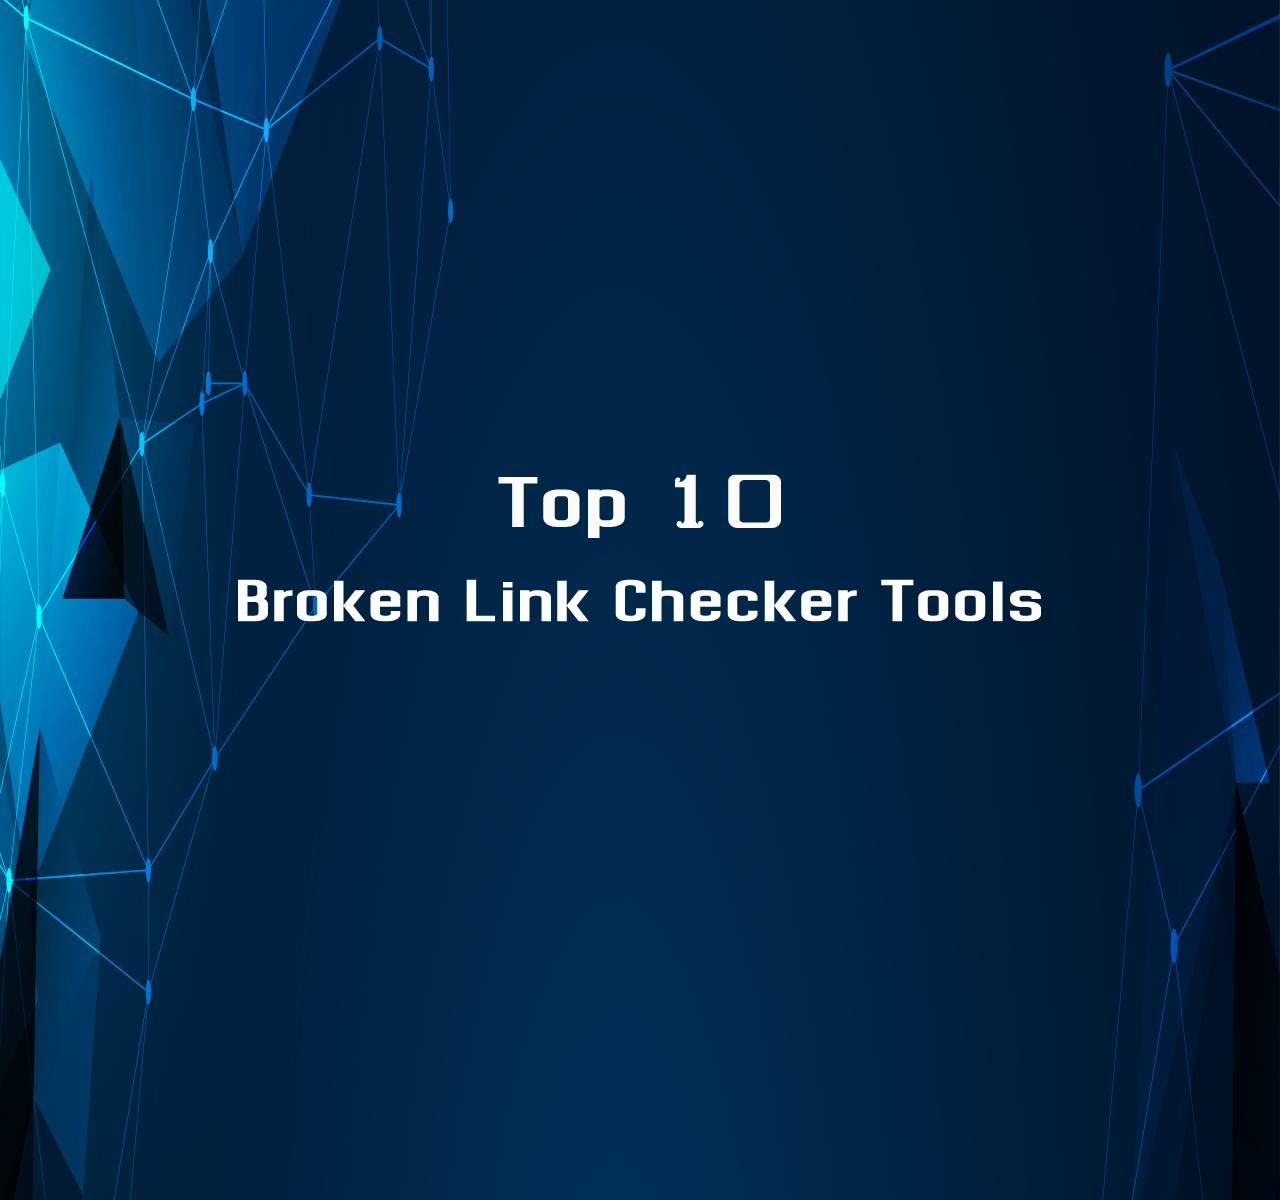 Broken Link Checker Tools